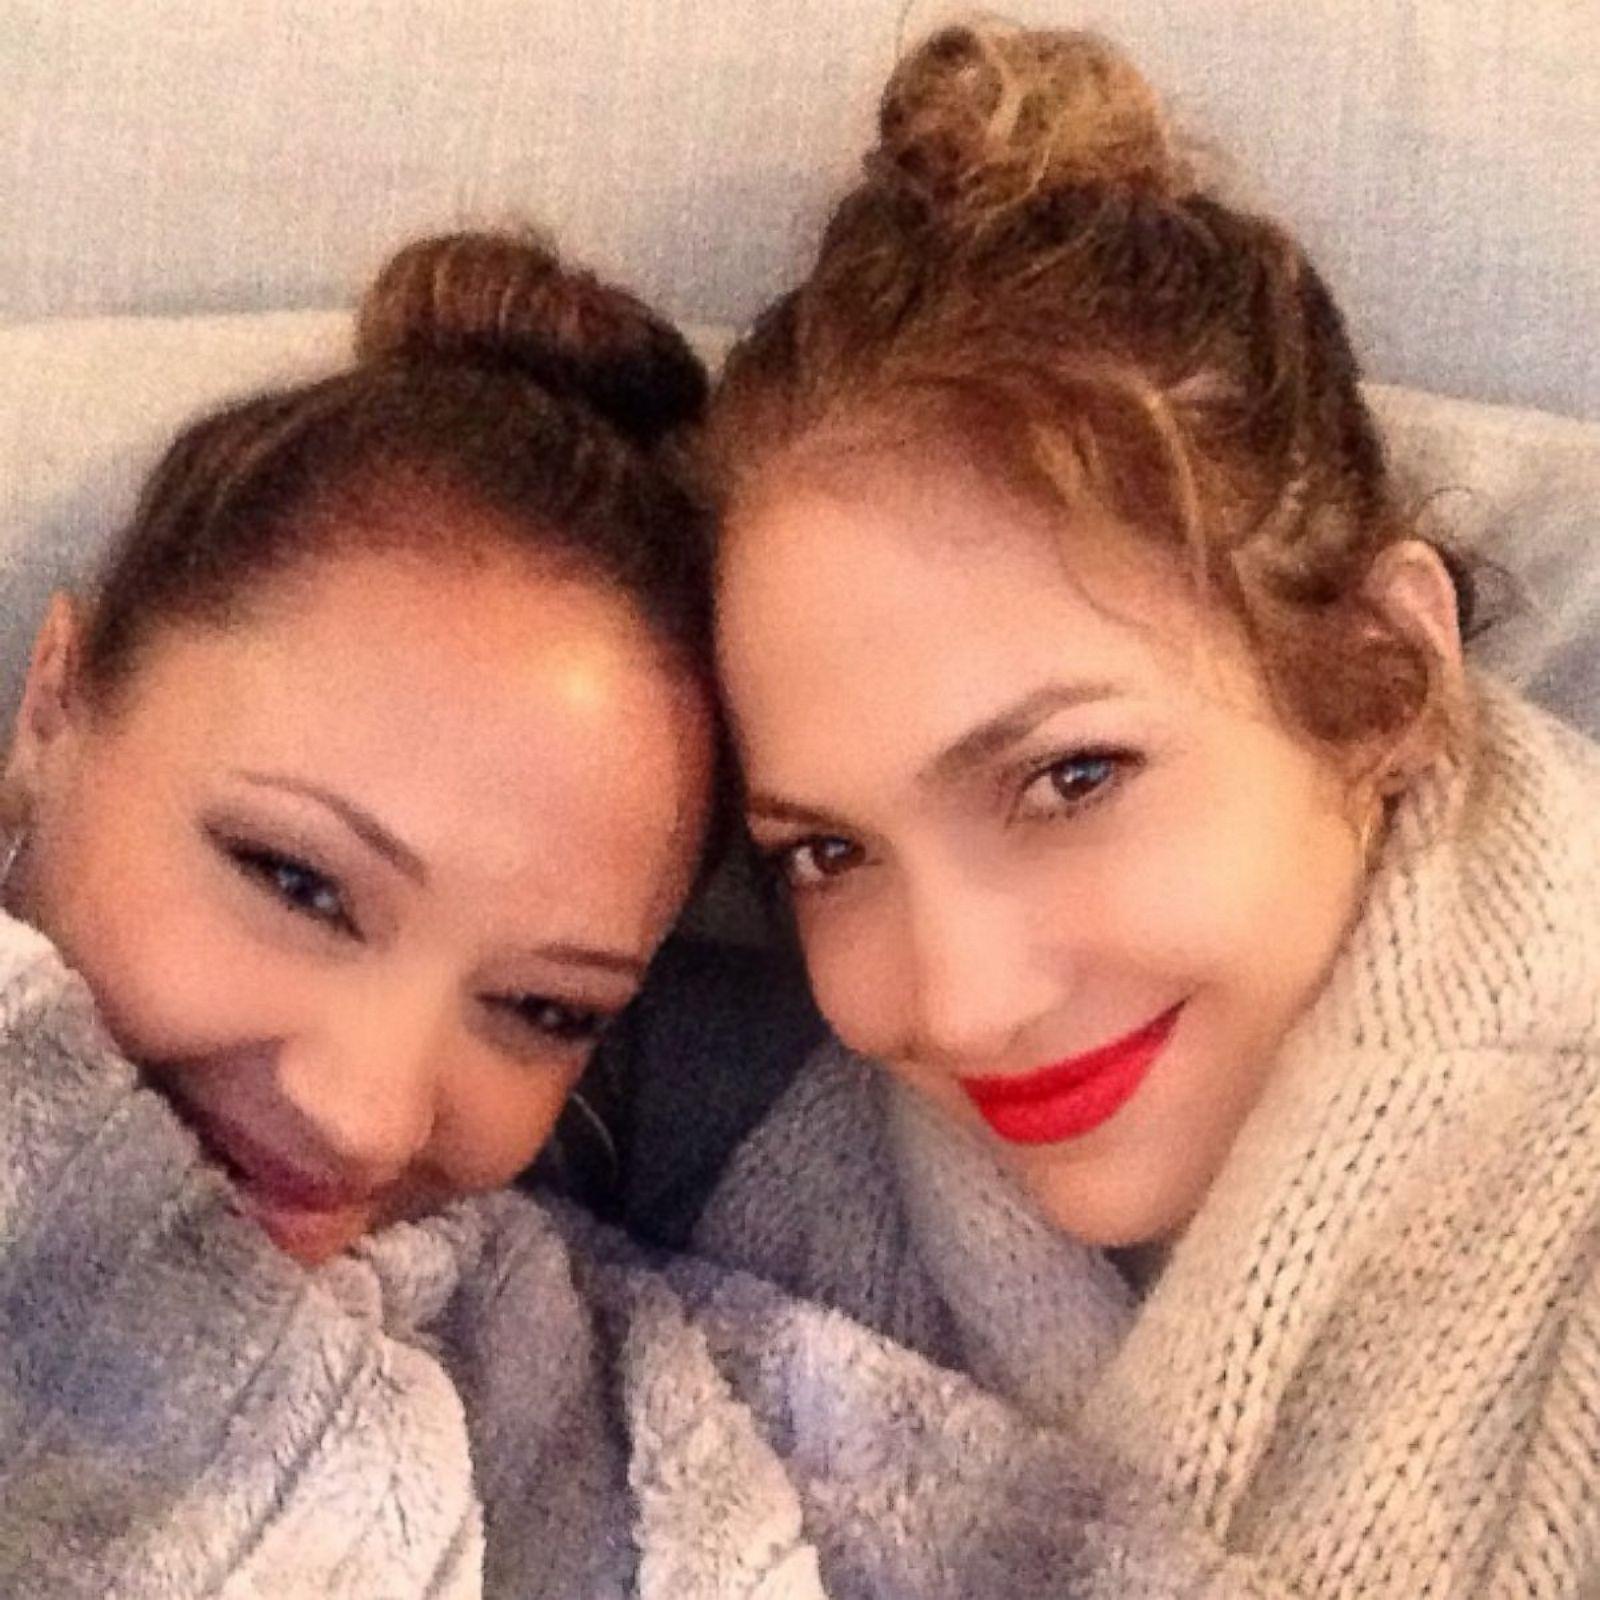 acc2faa29 Jennifer Lopez Through the Years Photos - ABC News